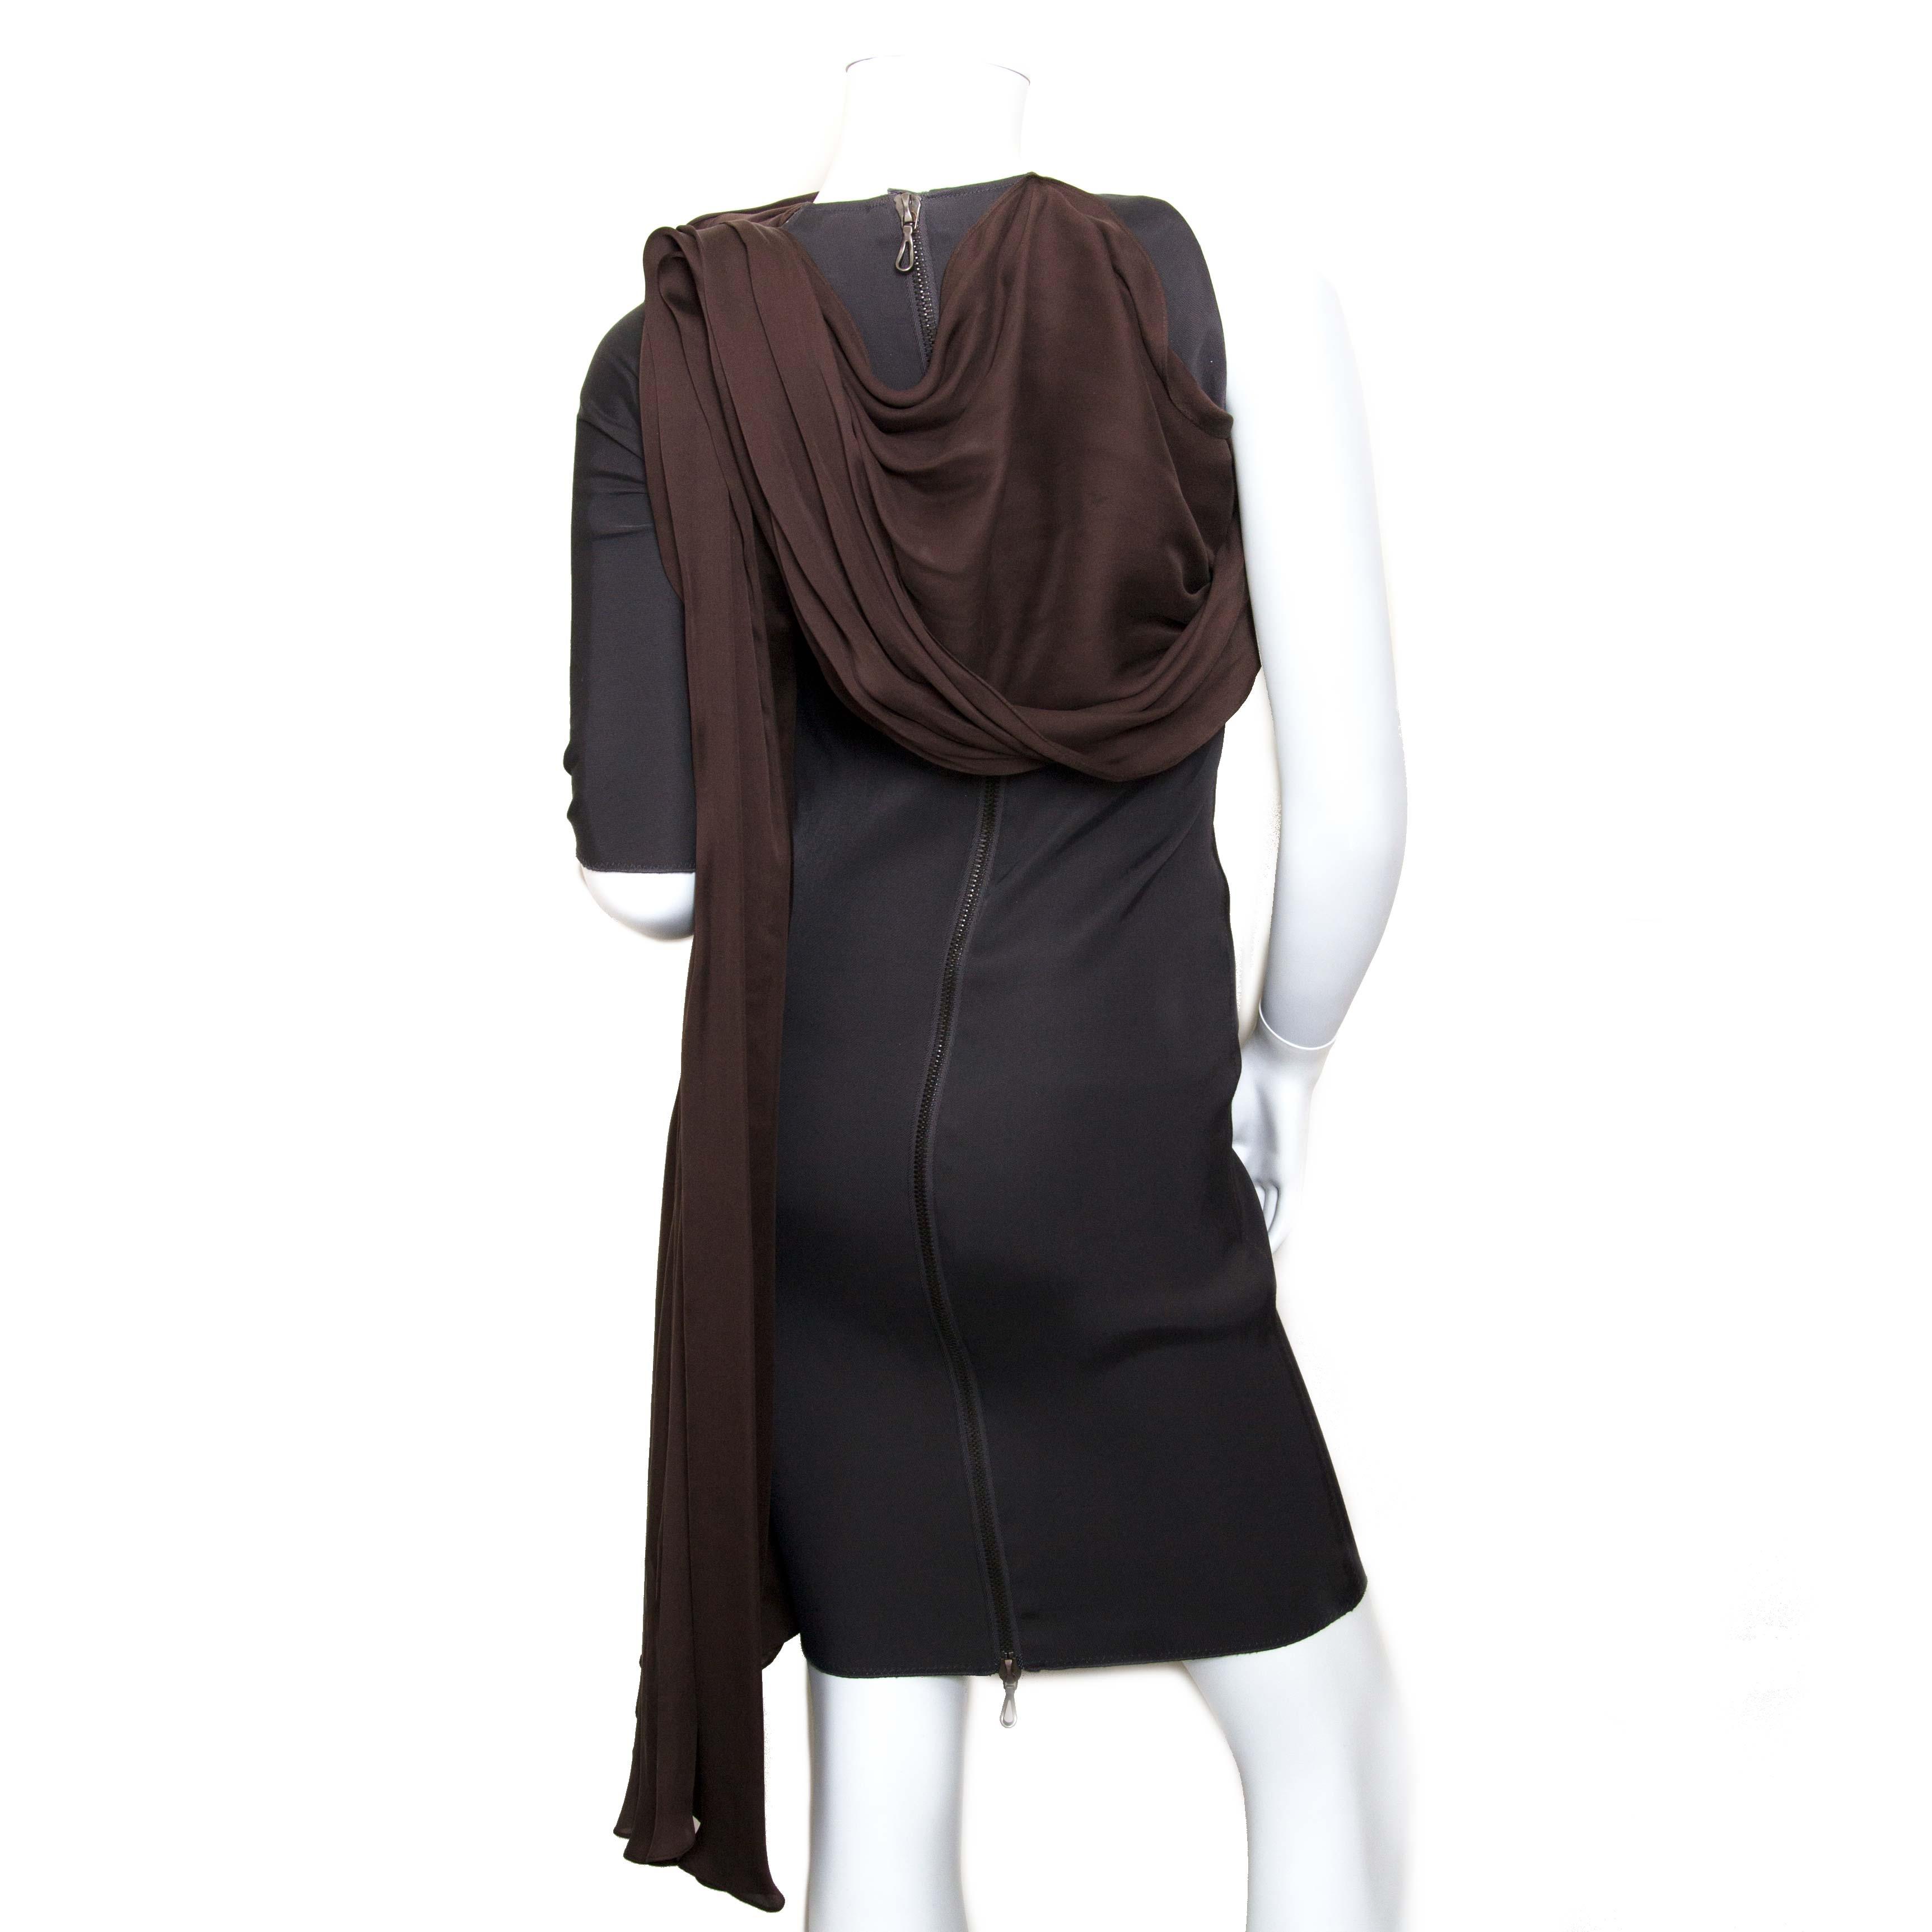 lanvin dark brown dress now for sale at labellov vintage fashion webshop belgium